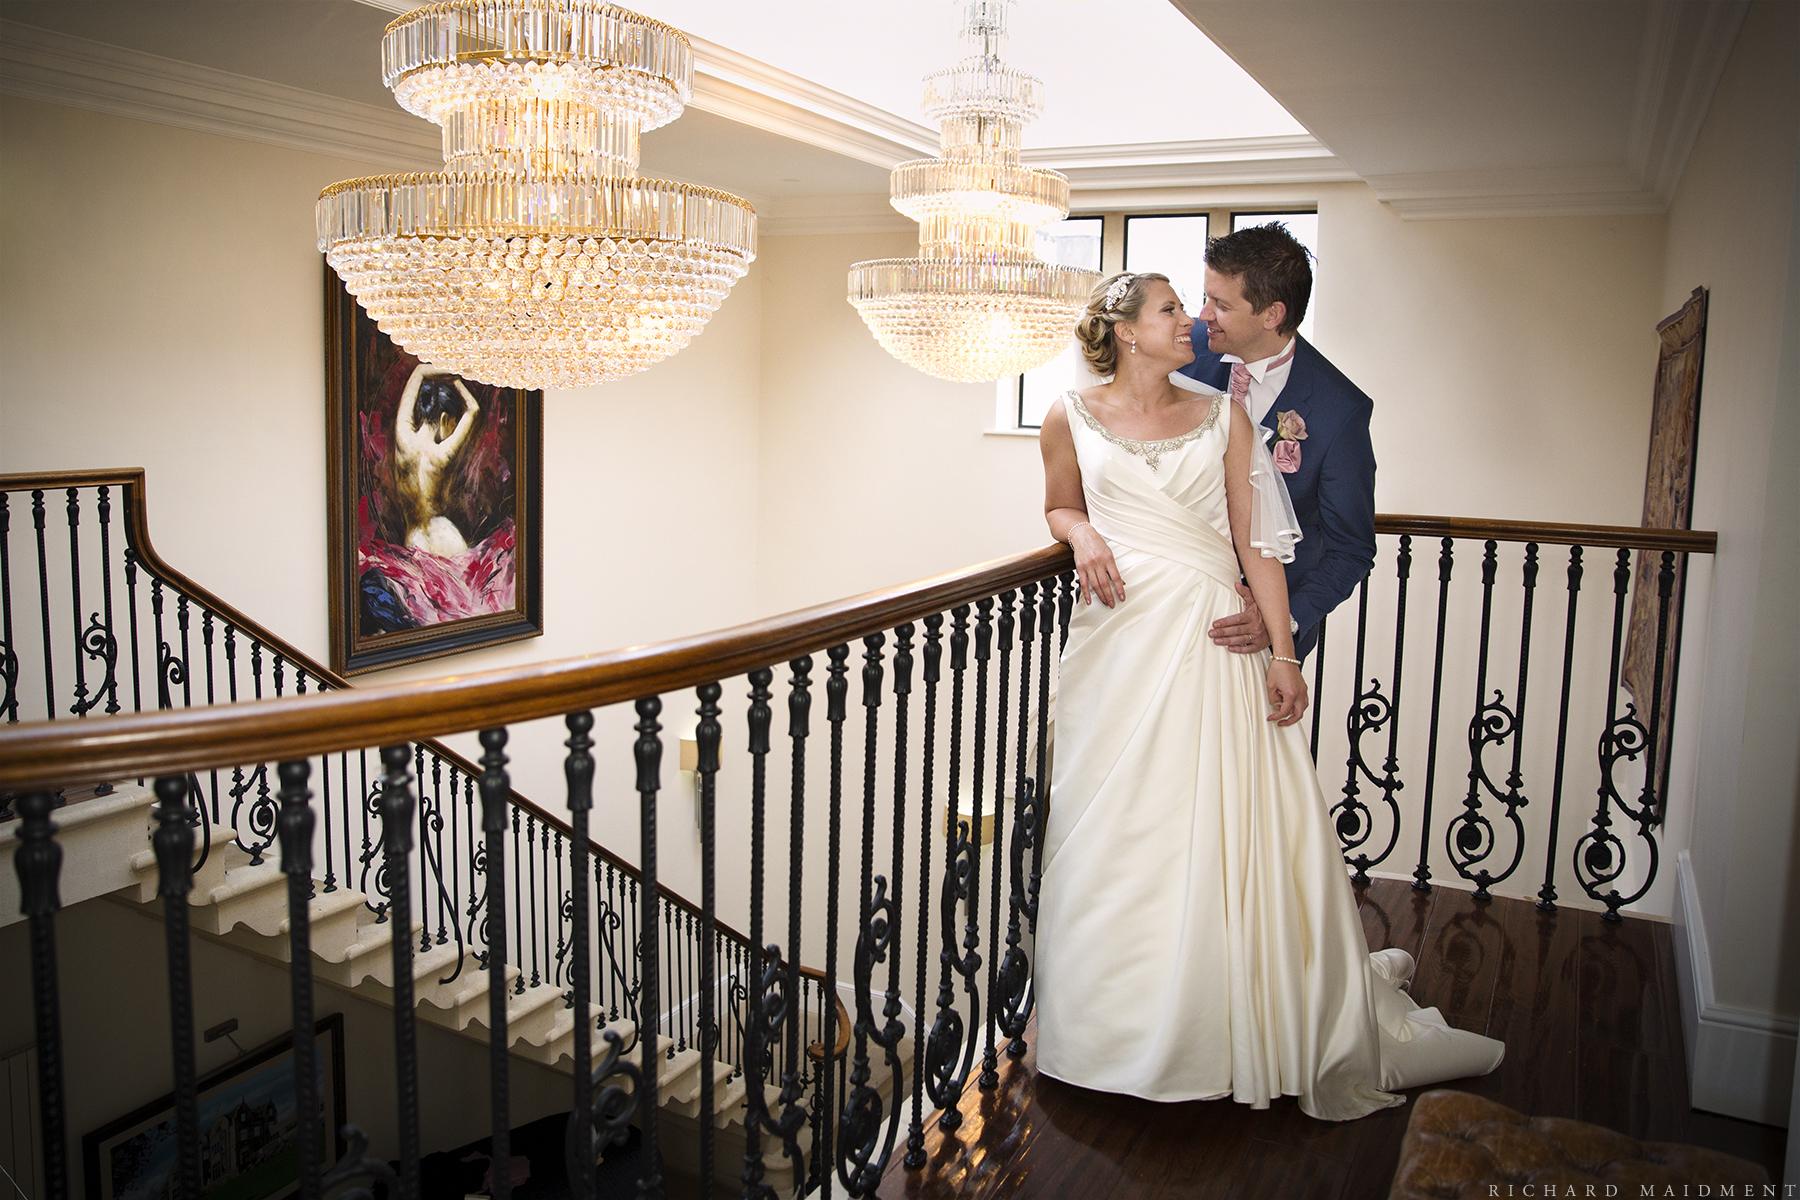 Richard Maidment - Wedding Photography (47).jpg